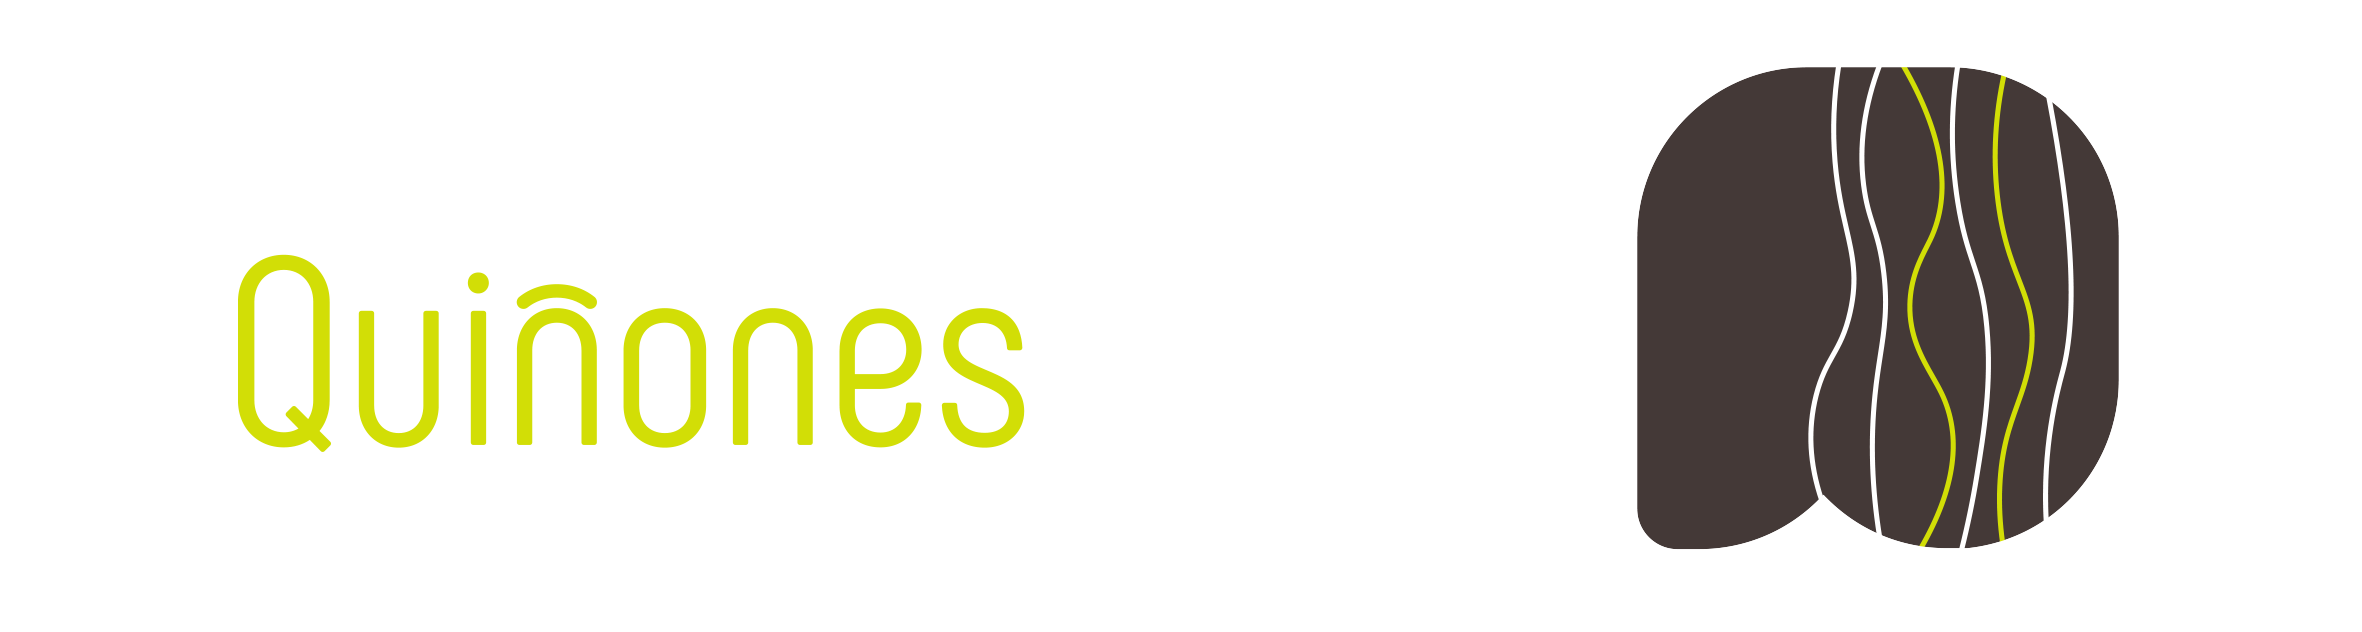 Clínica Dental – Quiñones Belzuz